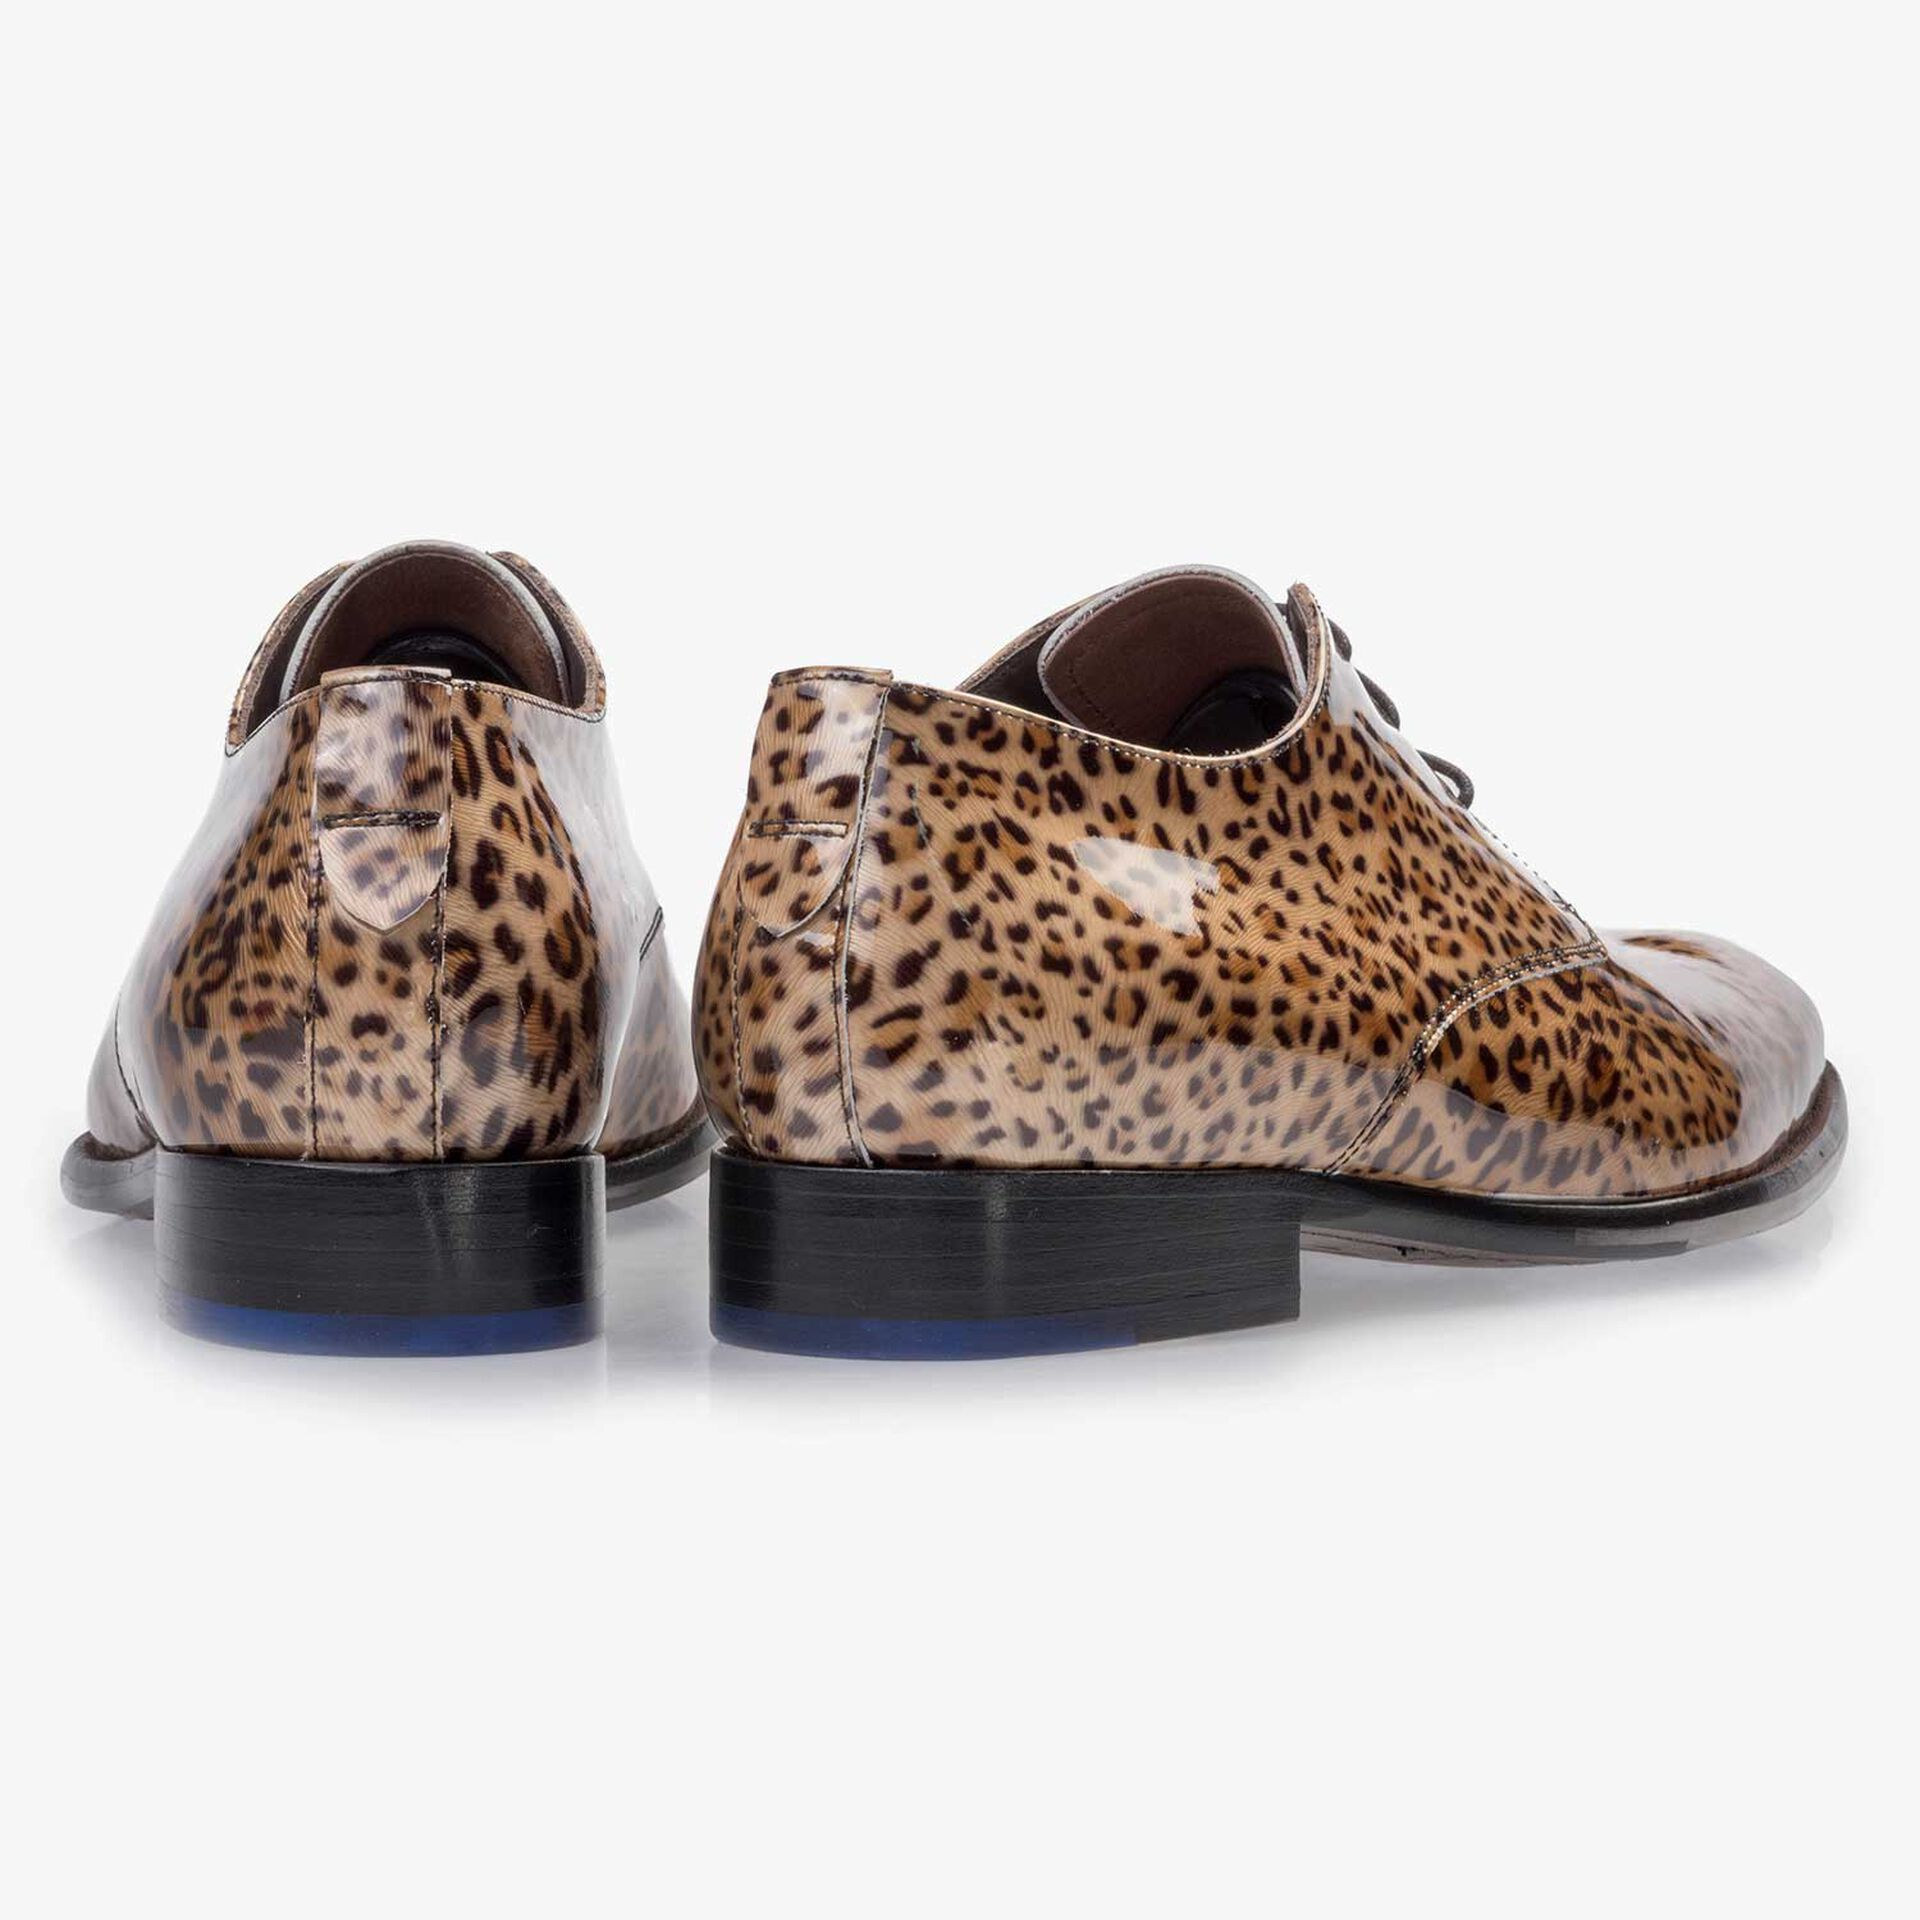 Premium brown patent leather lace shoe